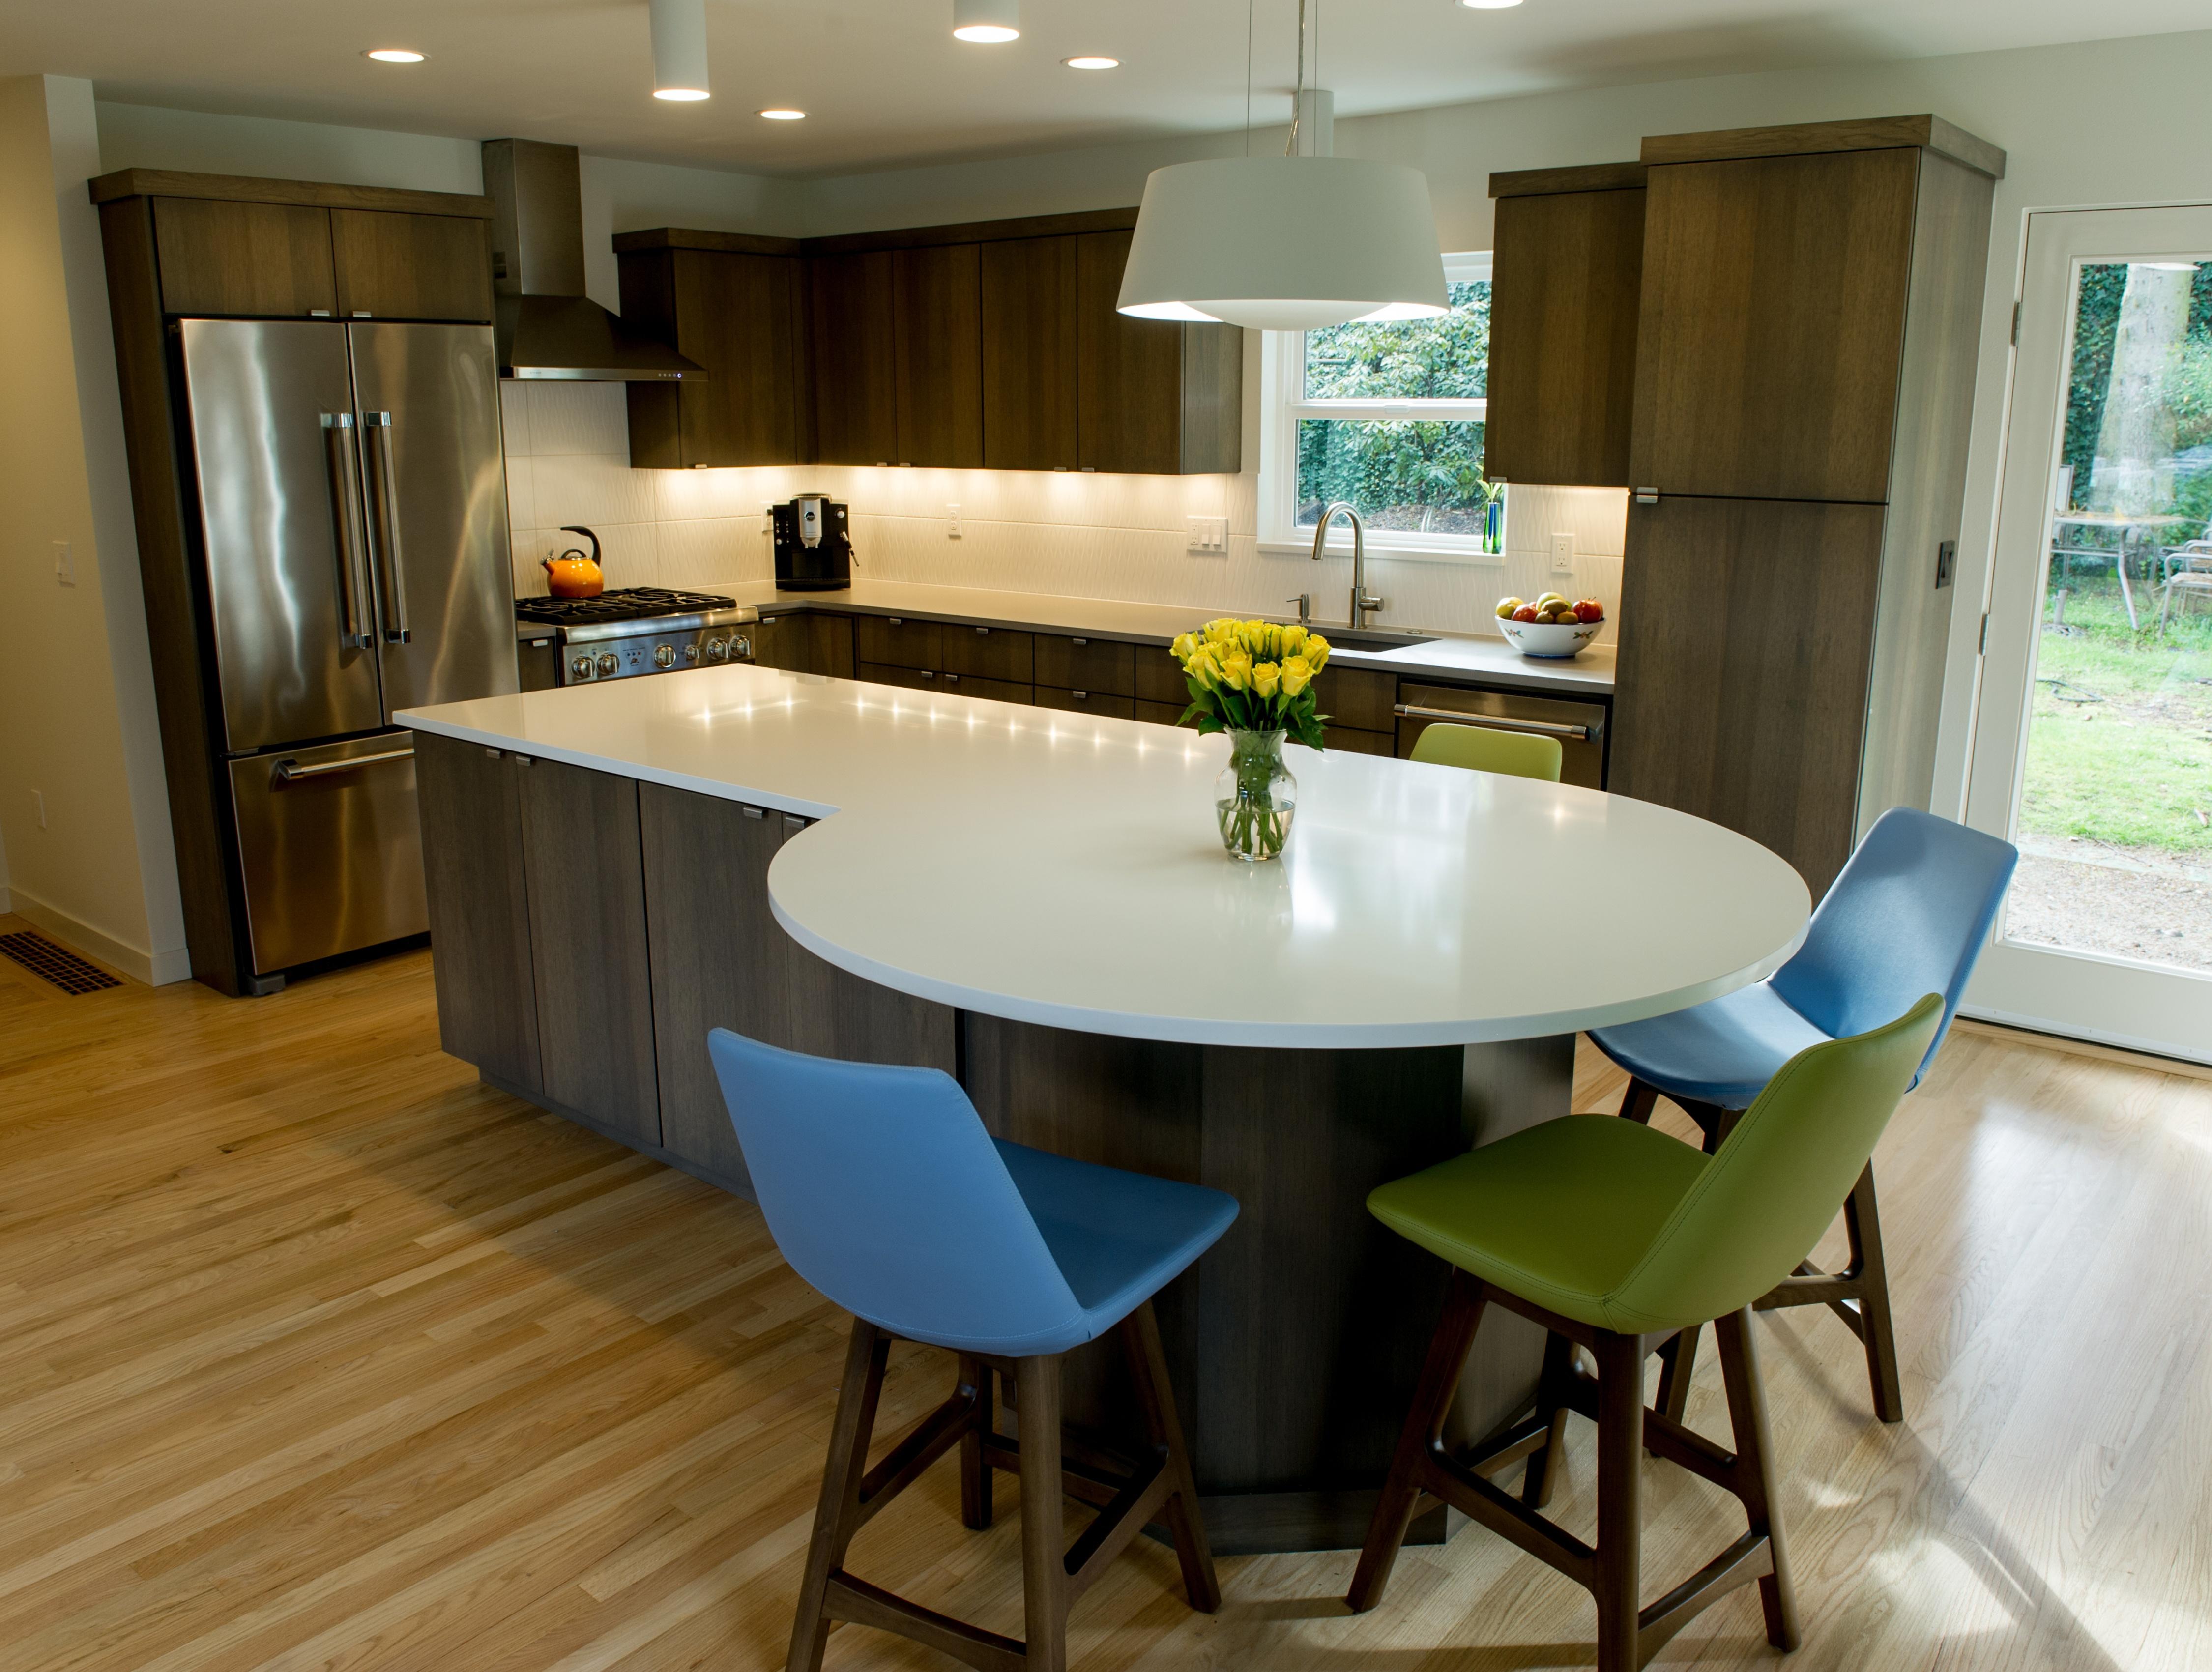 Round Kitchen Island - Portland Remodeling Company.jpg